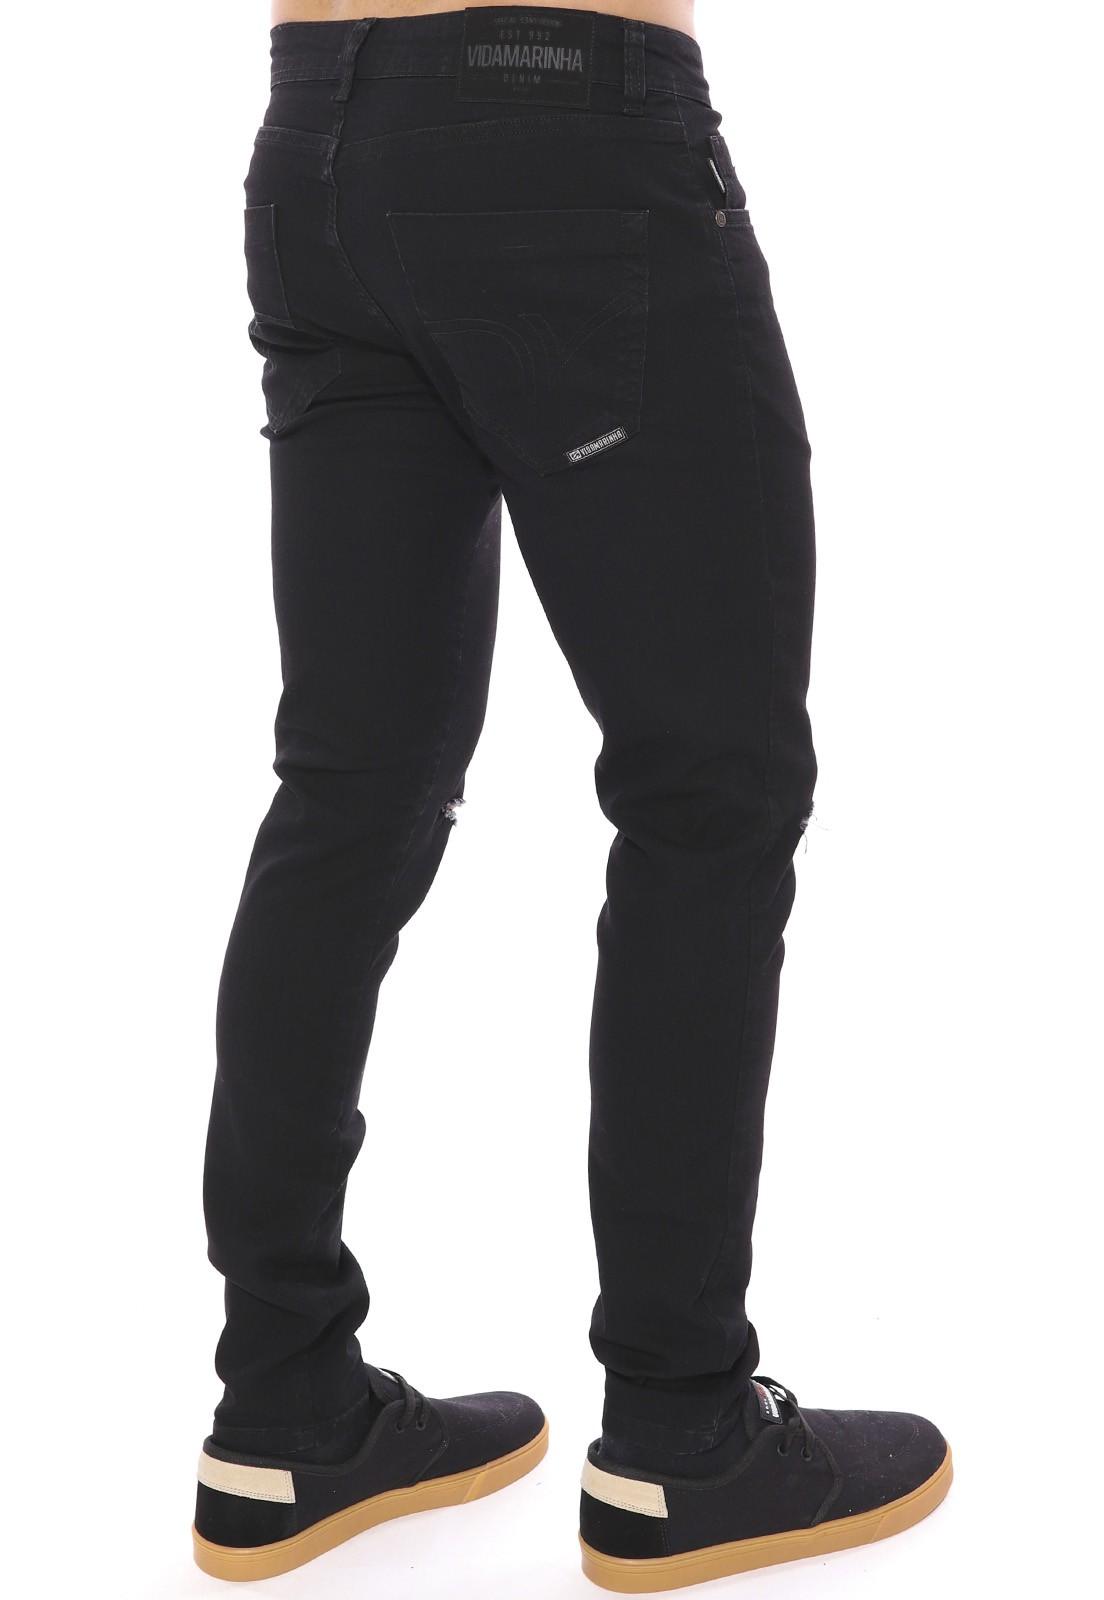 Calça Jeans Vida Marinha Skinny Preto